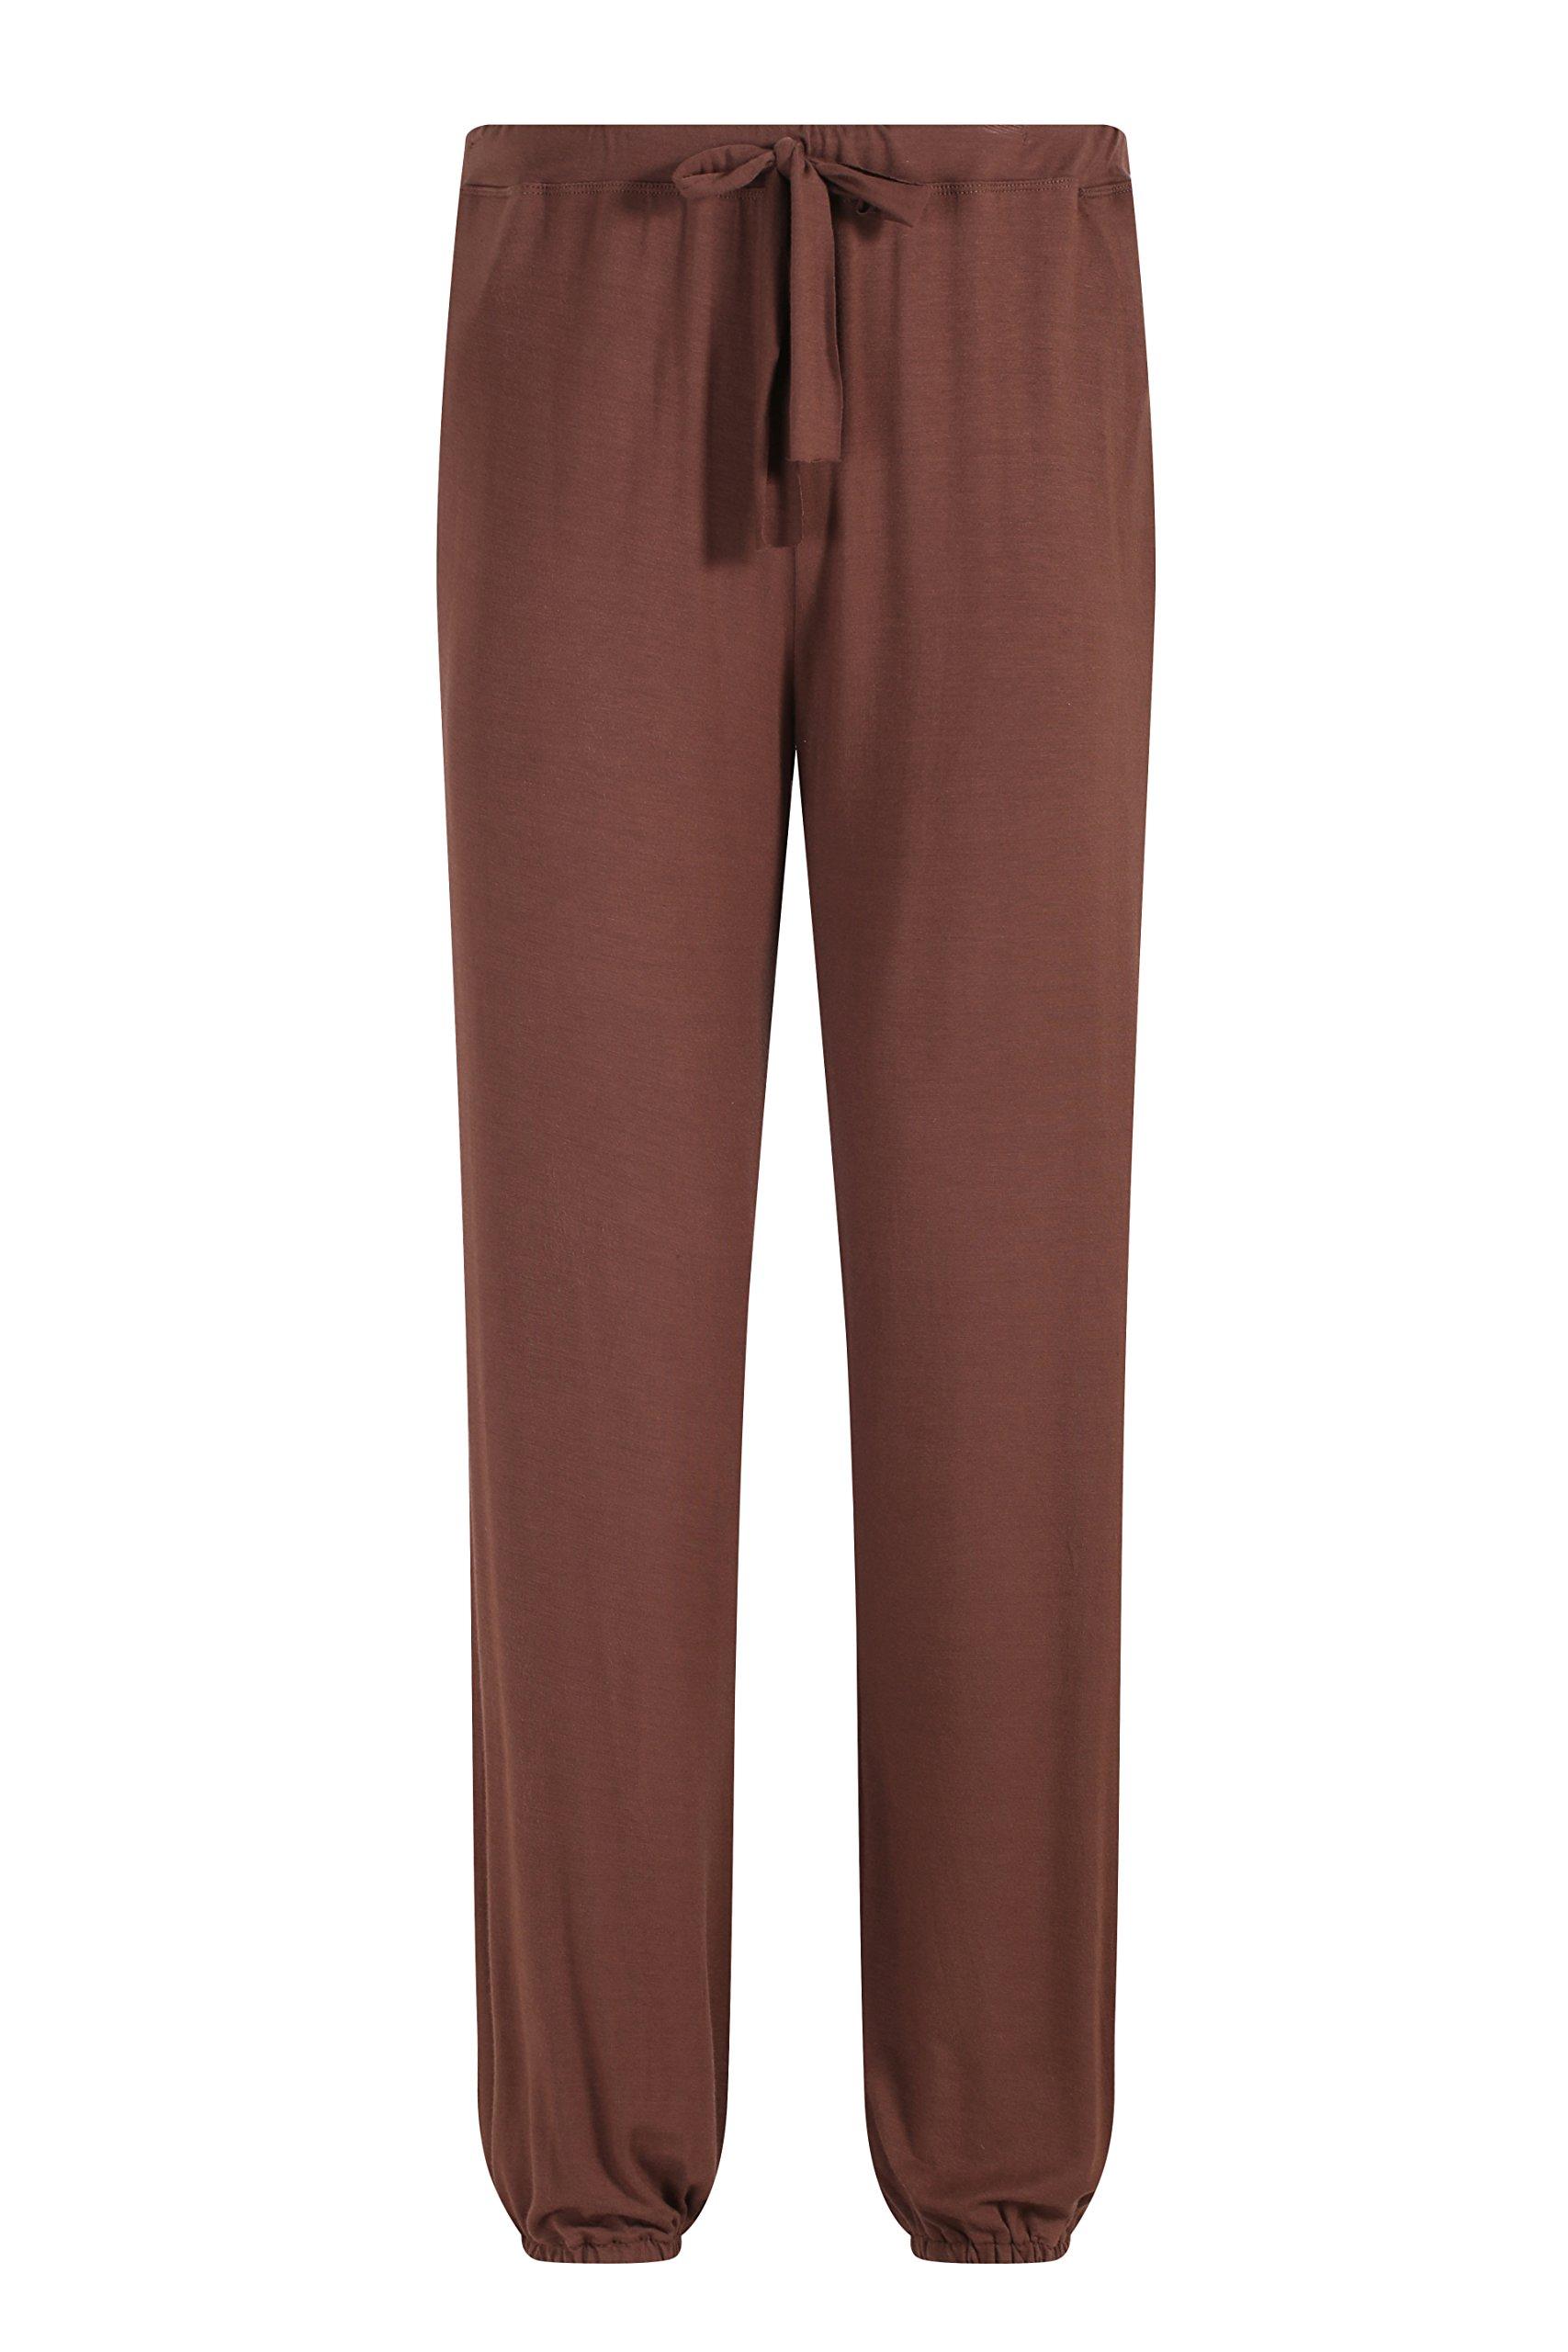 ZSHOW Men's Summer Long Casual Pants Loose Fit Yoga Pants Lounging Sleep Pockets Pants(Coffee,XL)